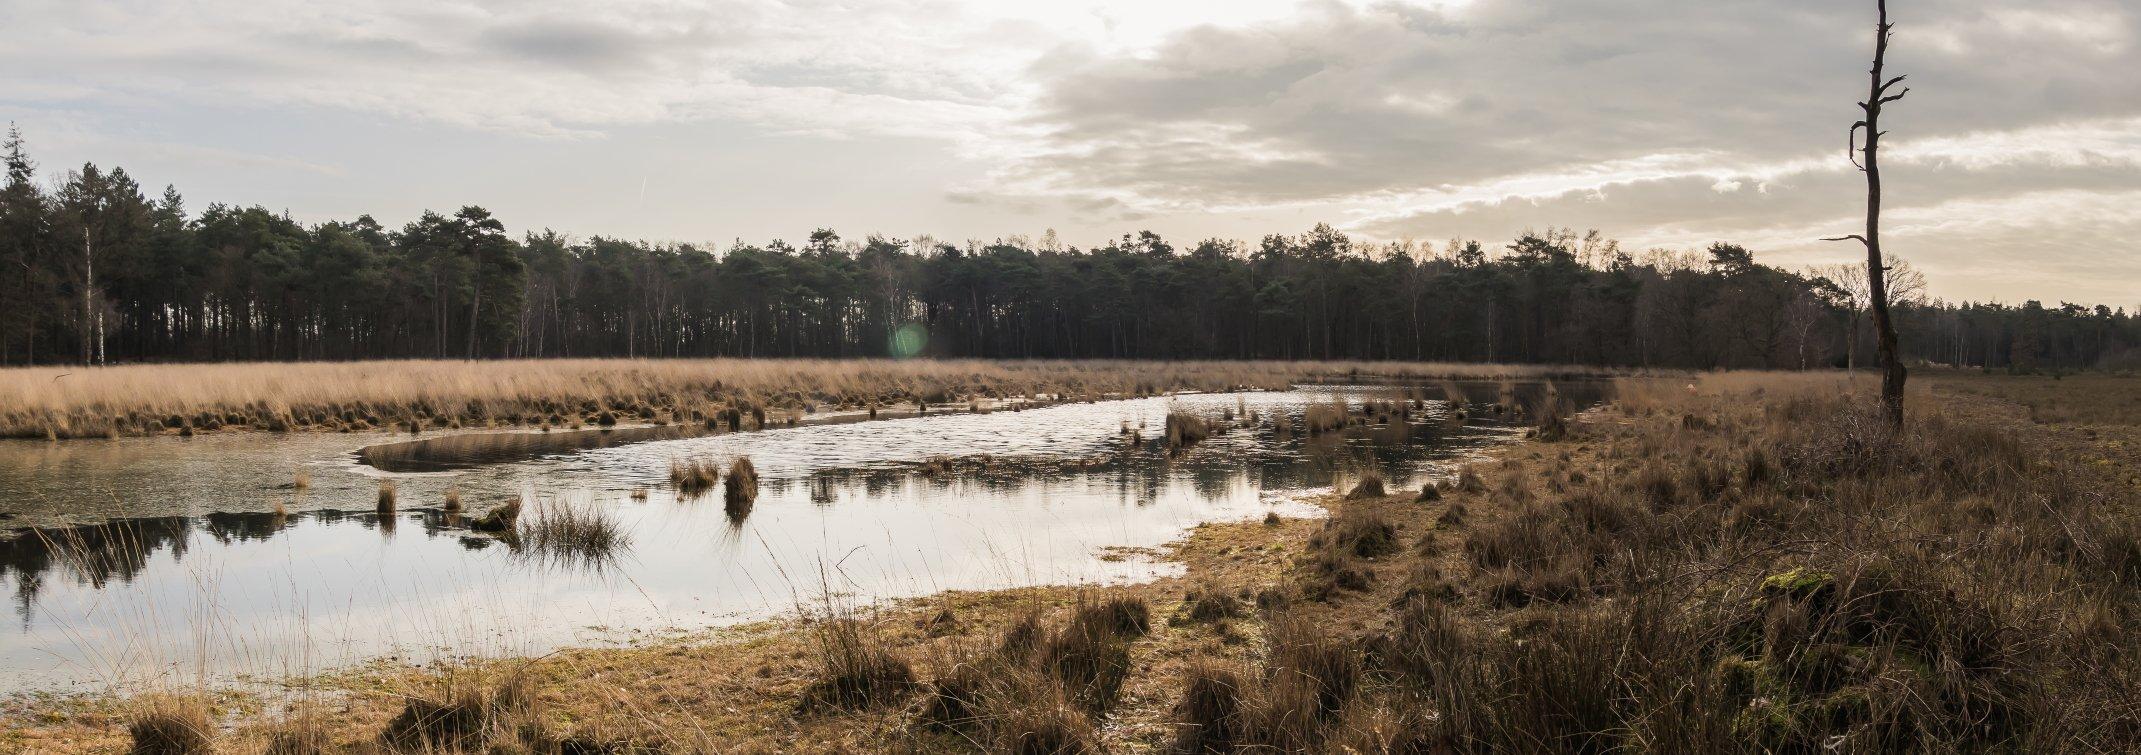 natuur 3 Galderse Heide (12)